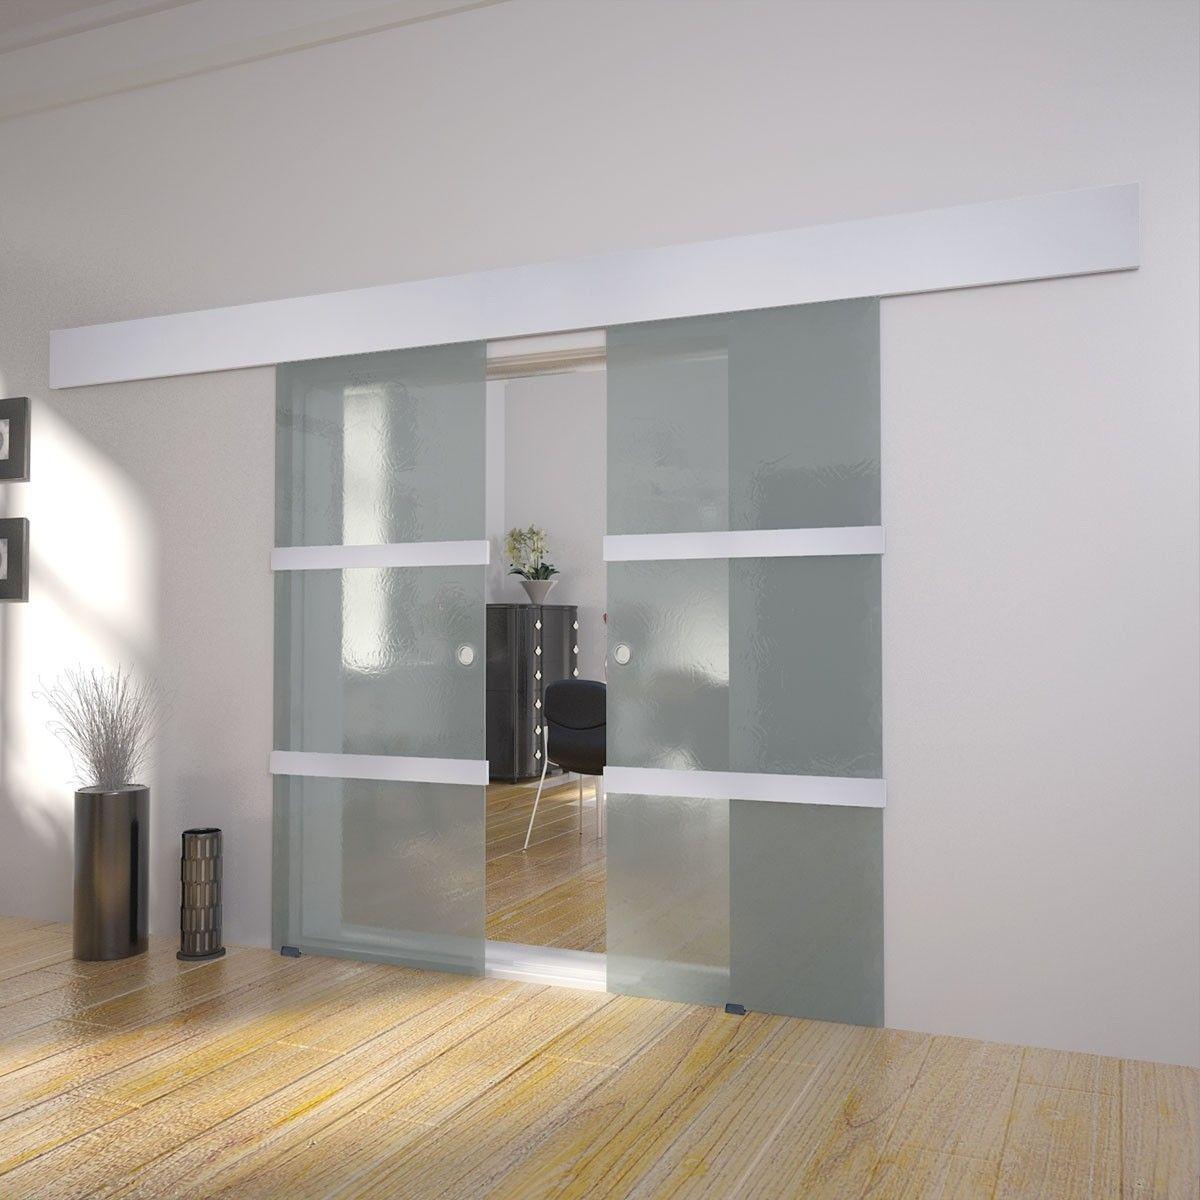 Vidaxl doble skyved rer glass 273735 - Pintar paredes blancas ...